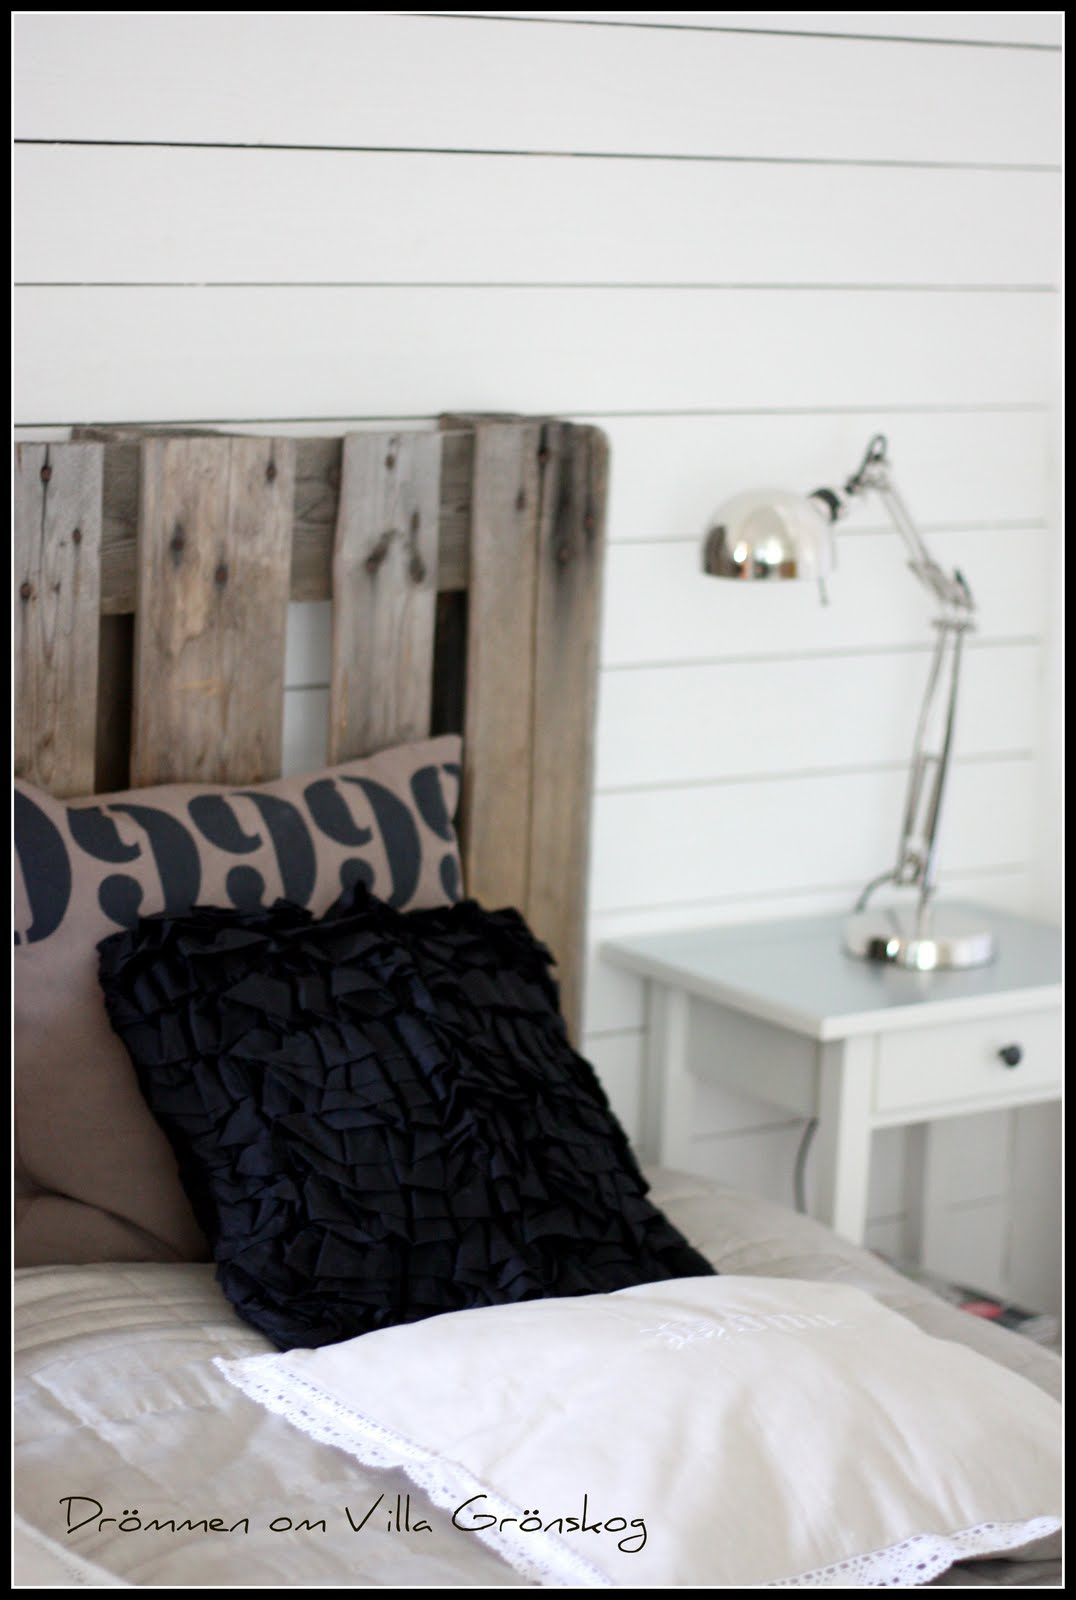 Drömmen om villa grönskog: sovrum.....